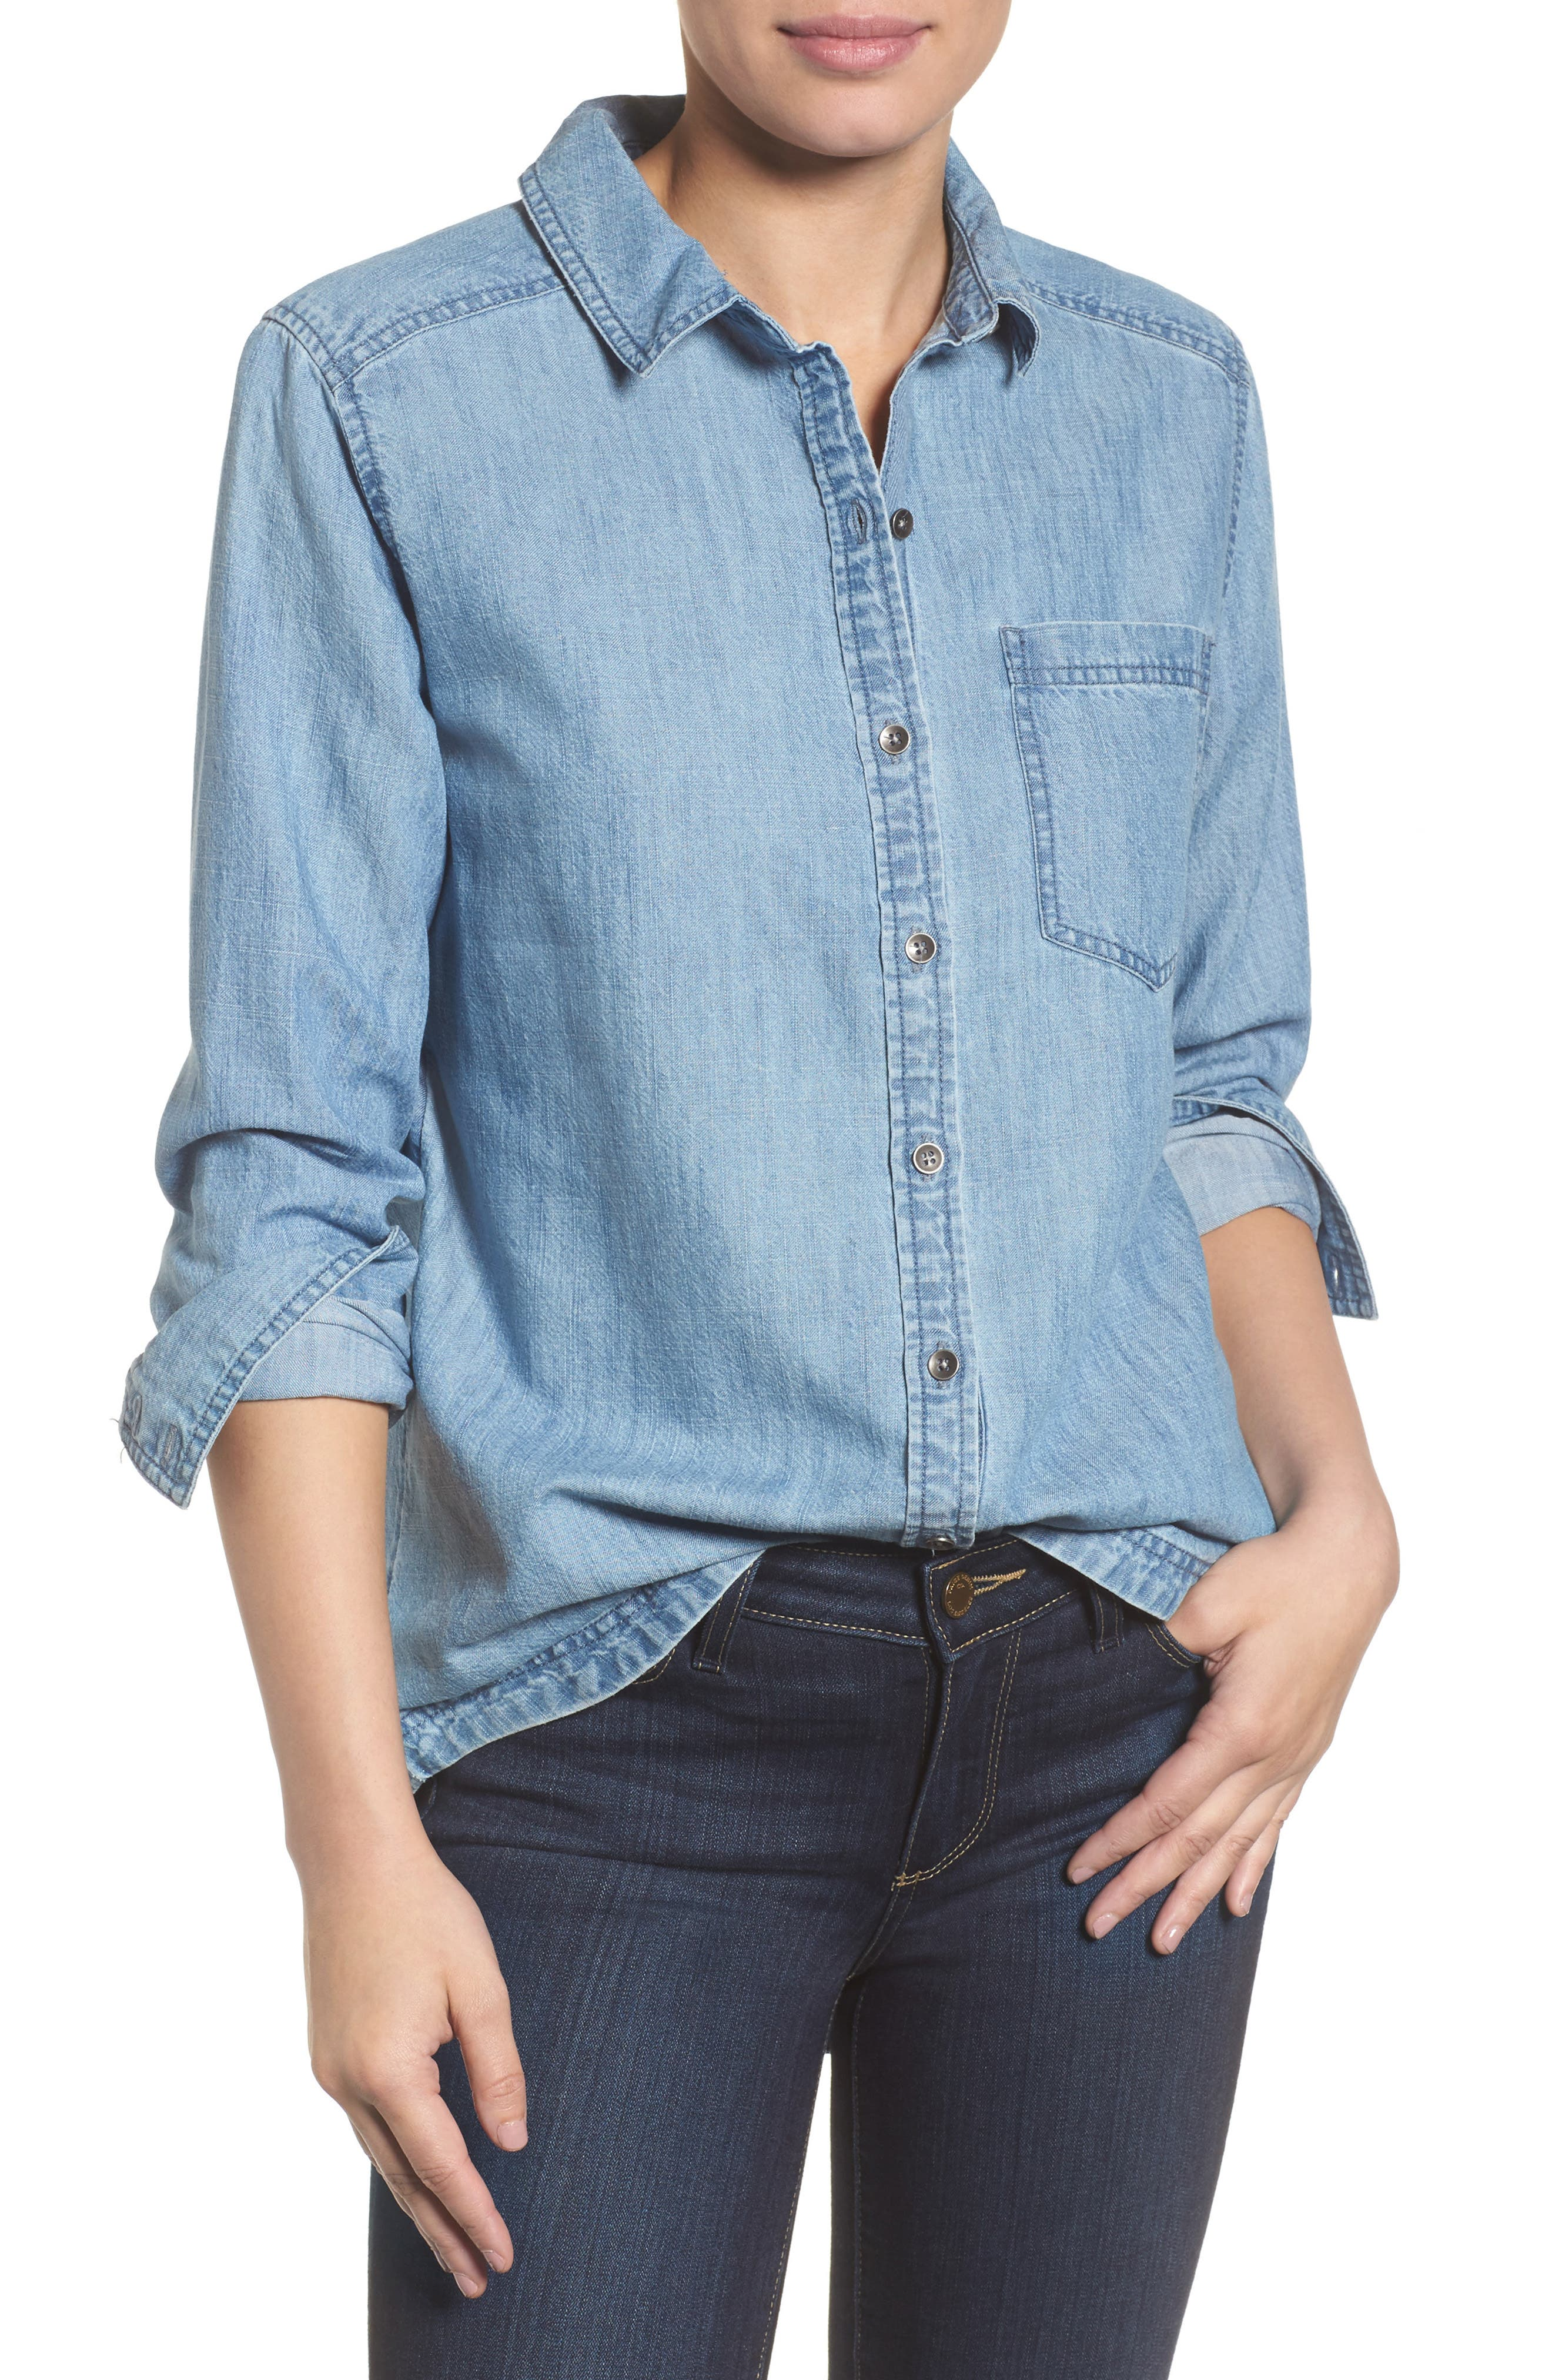 Alternate Image 1 Selected - Caslon® Button Front Chambray Shirt (Regular & Petite)